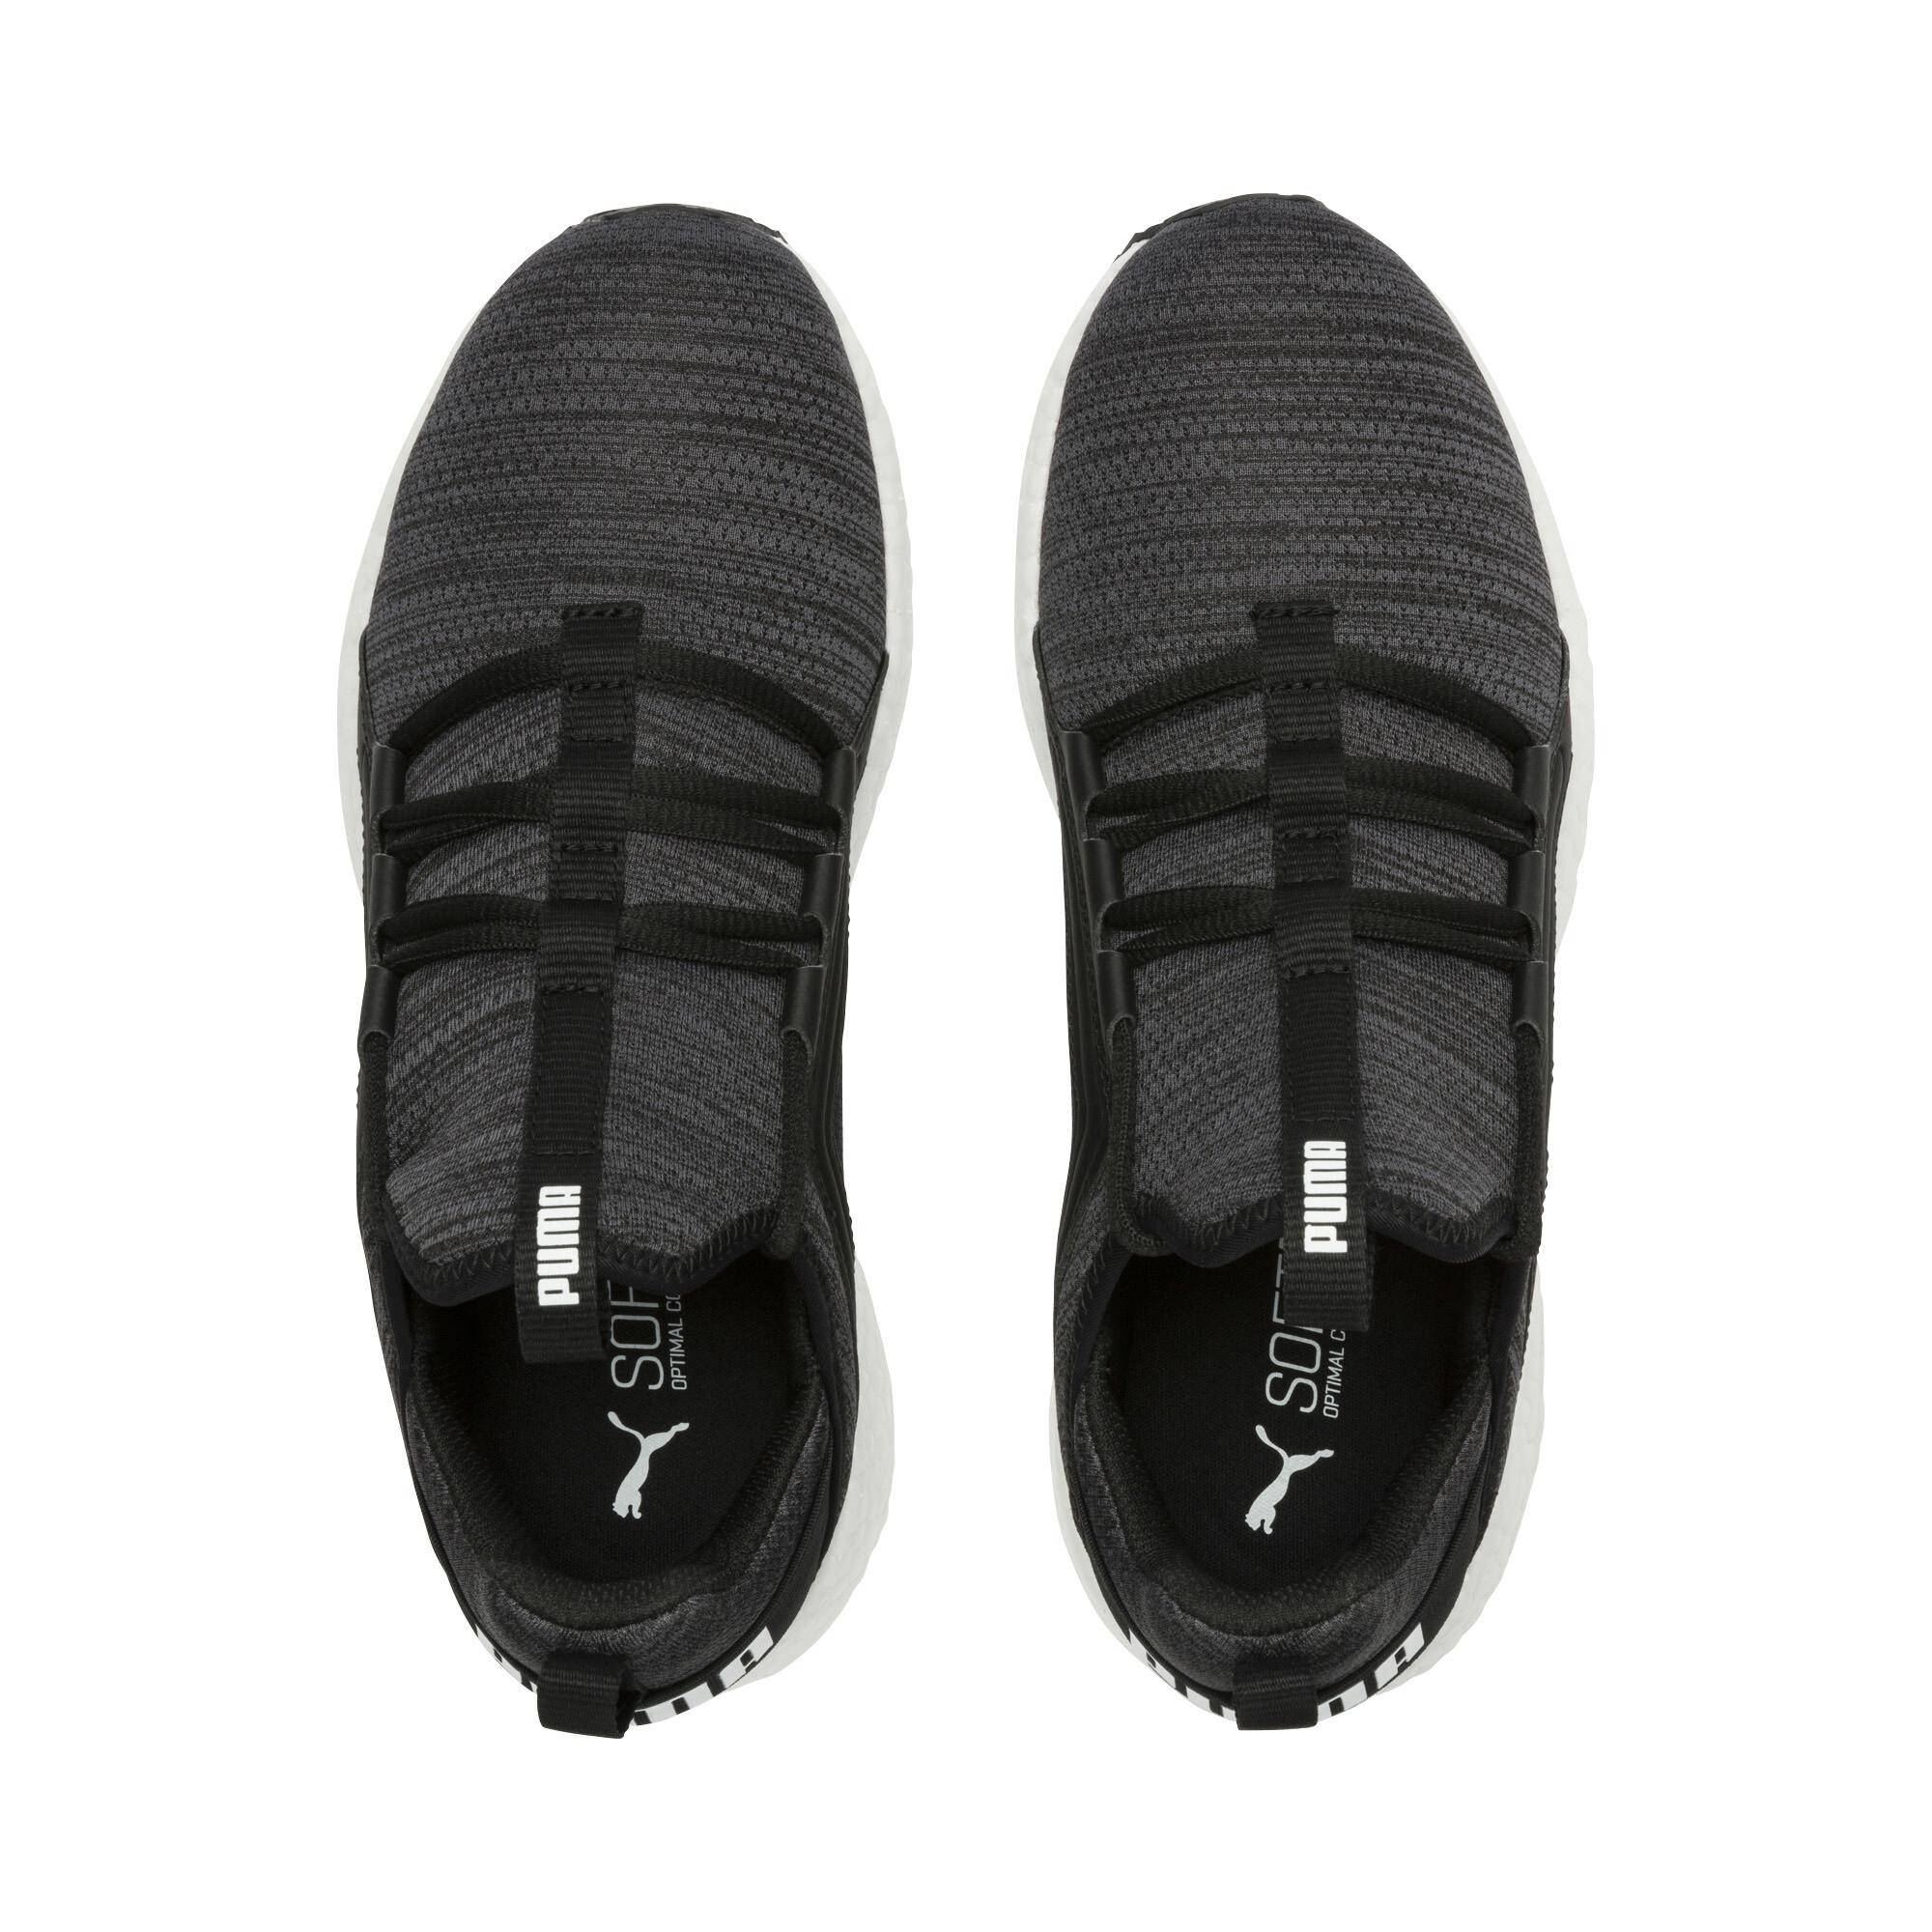 Zapatillas para correr Mega Energy Heather Knit para mujer